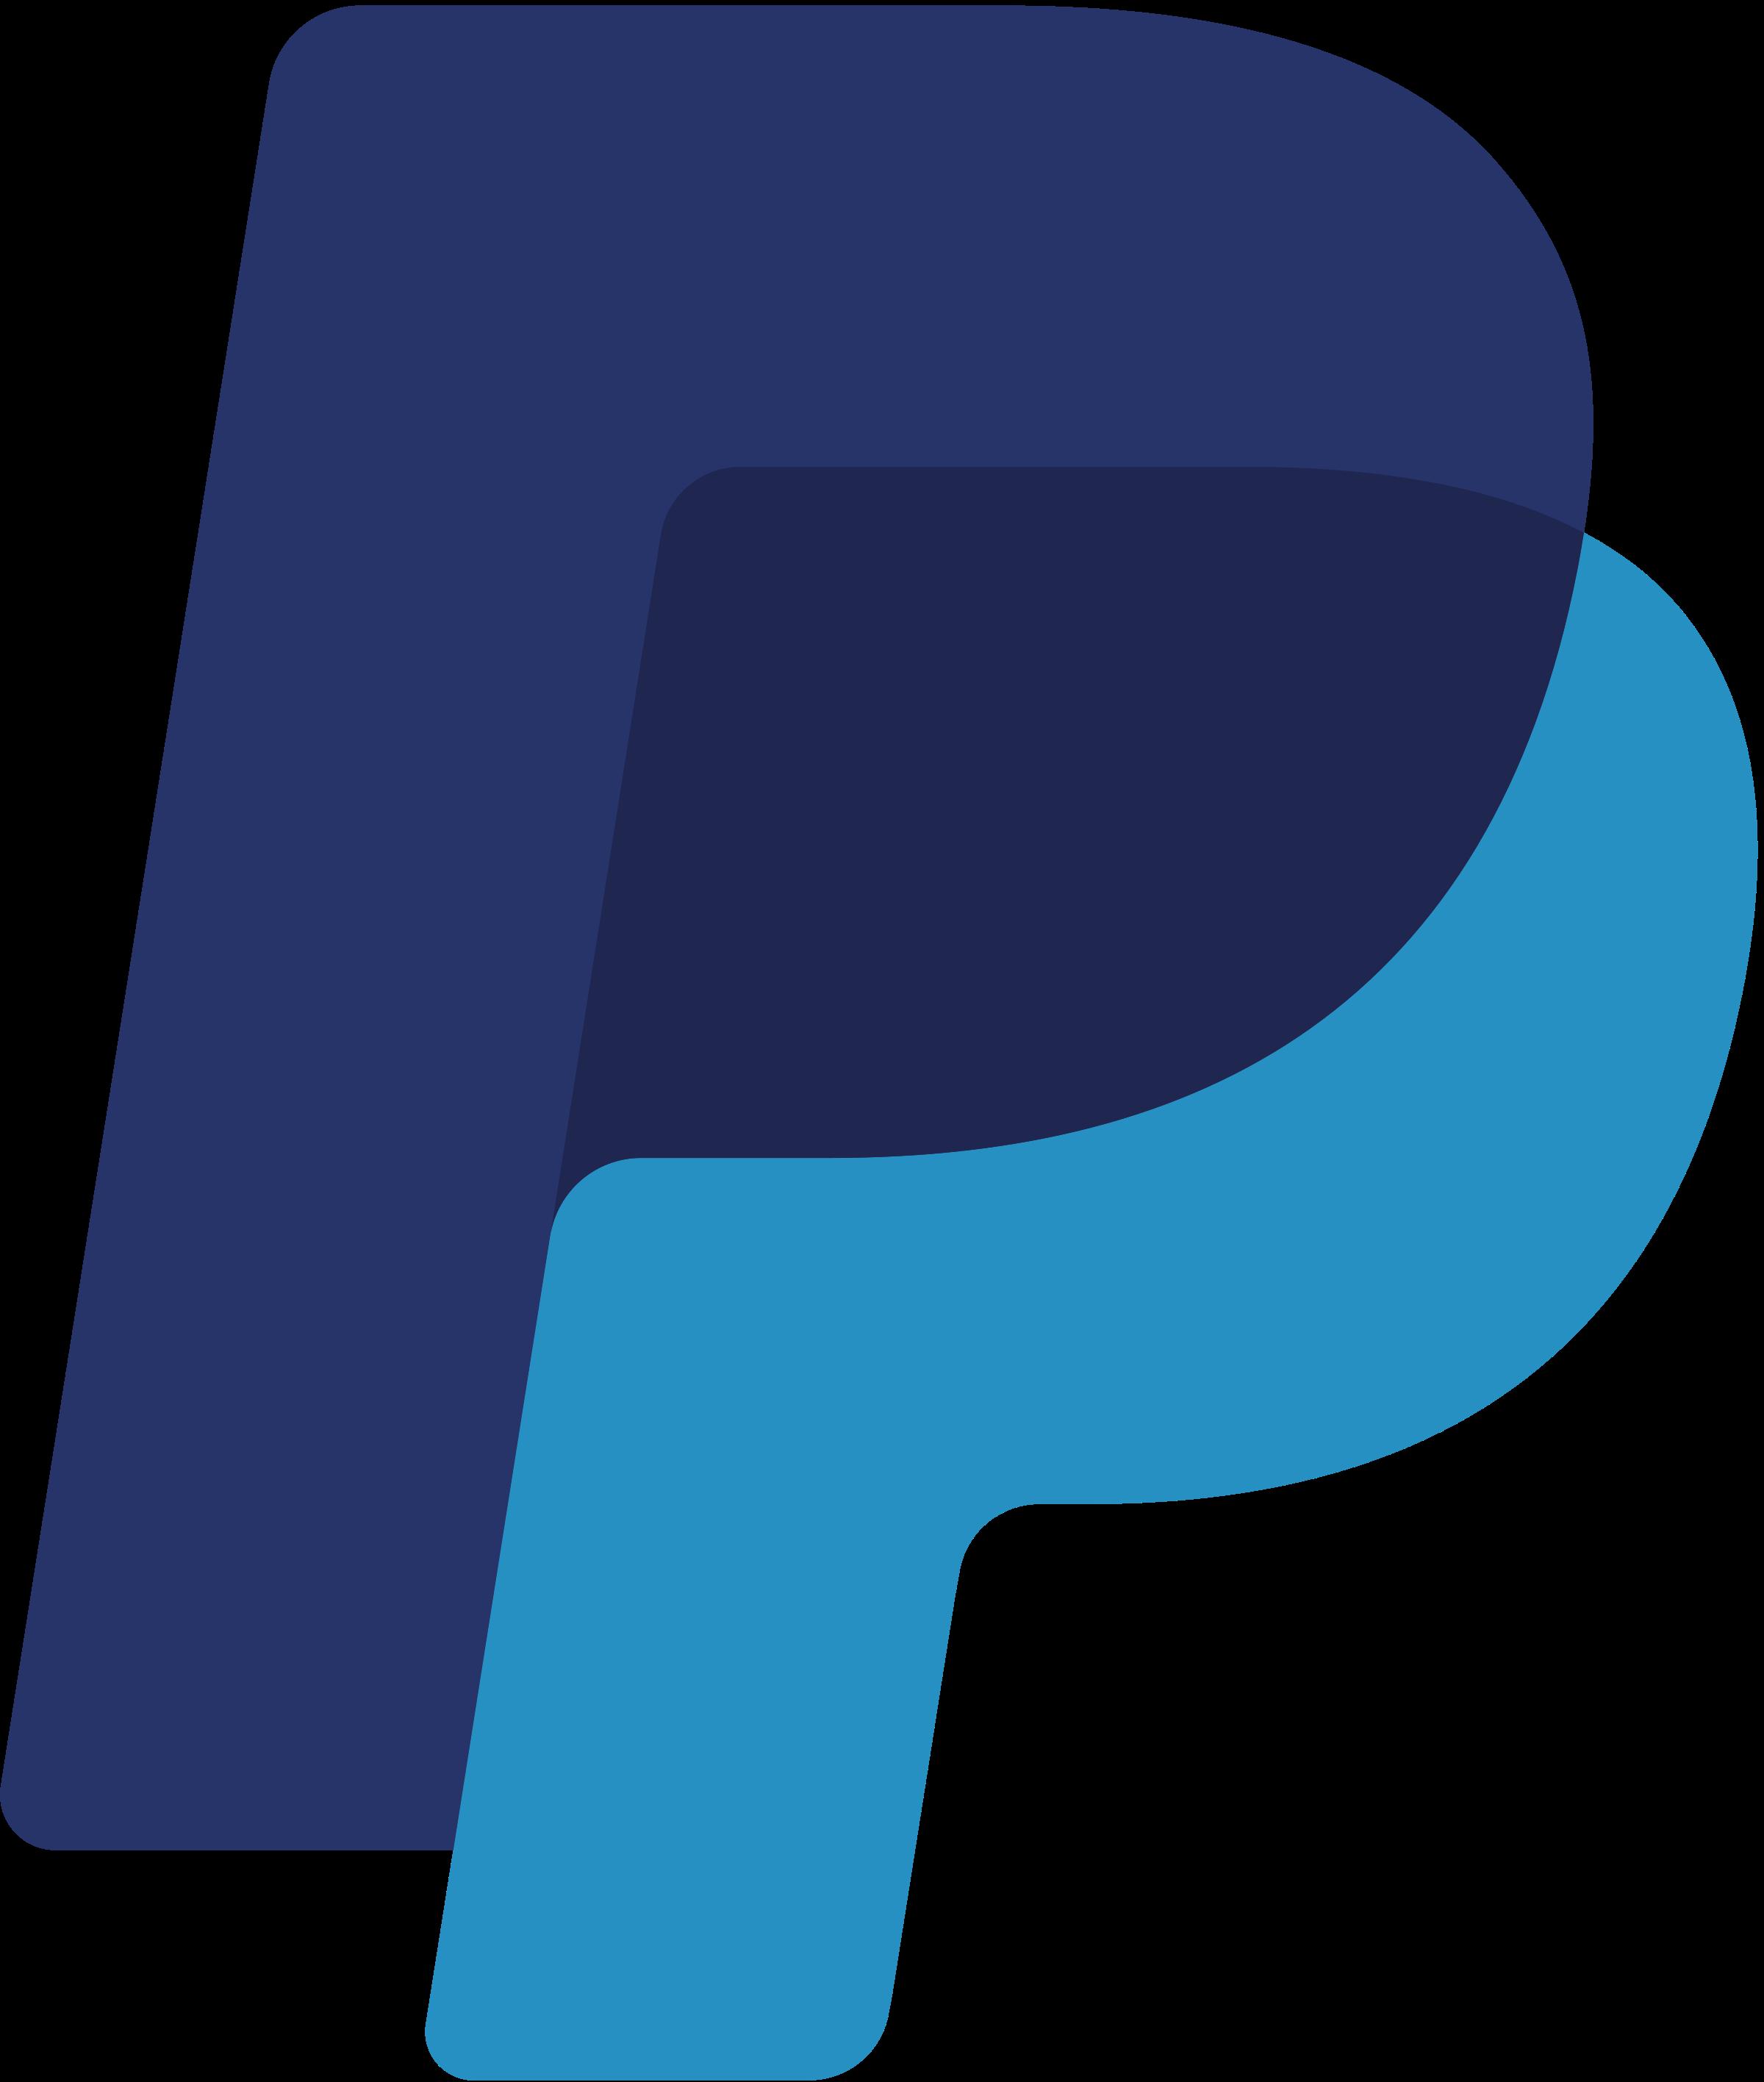 Paypal Transparent Logo